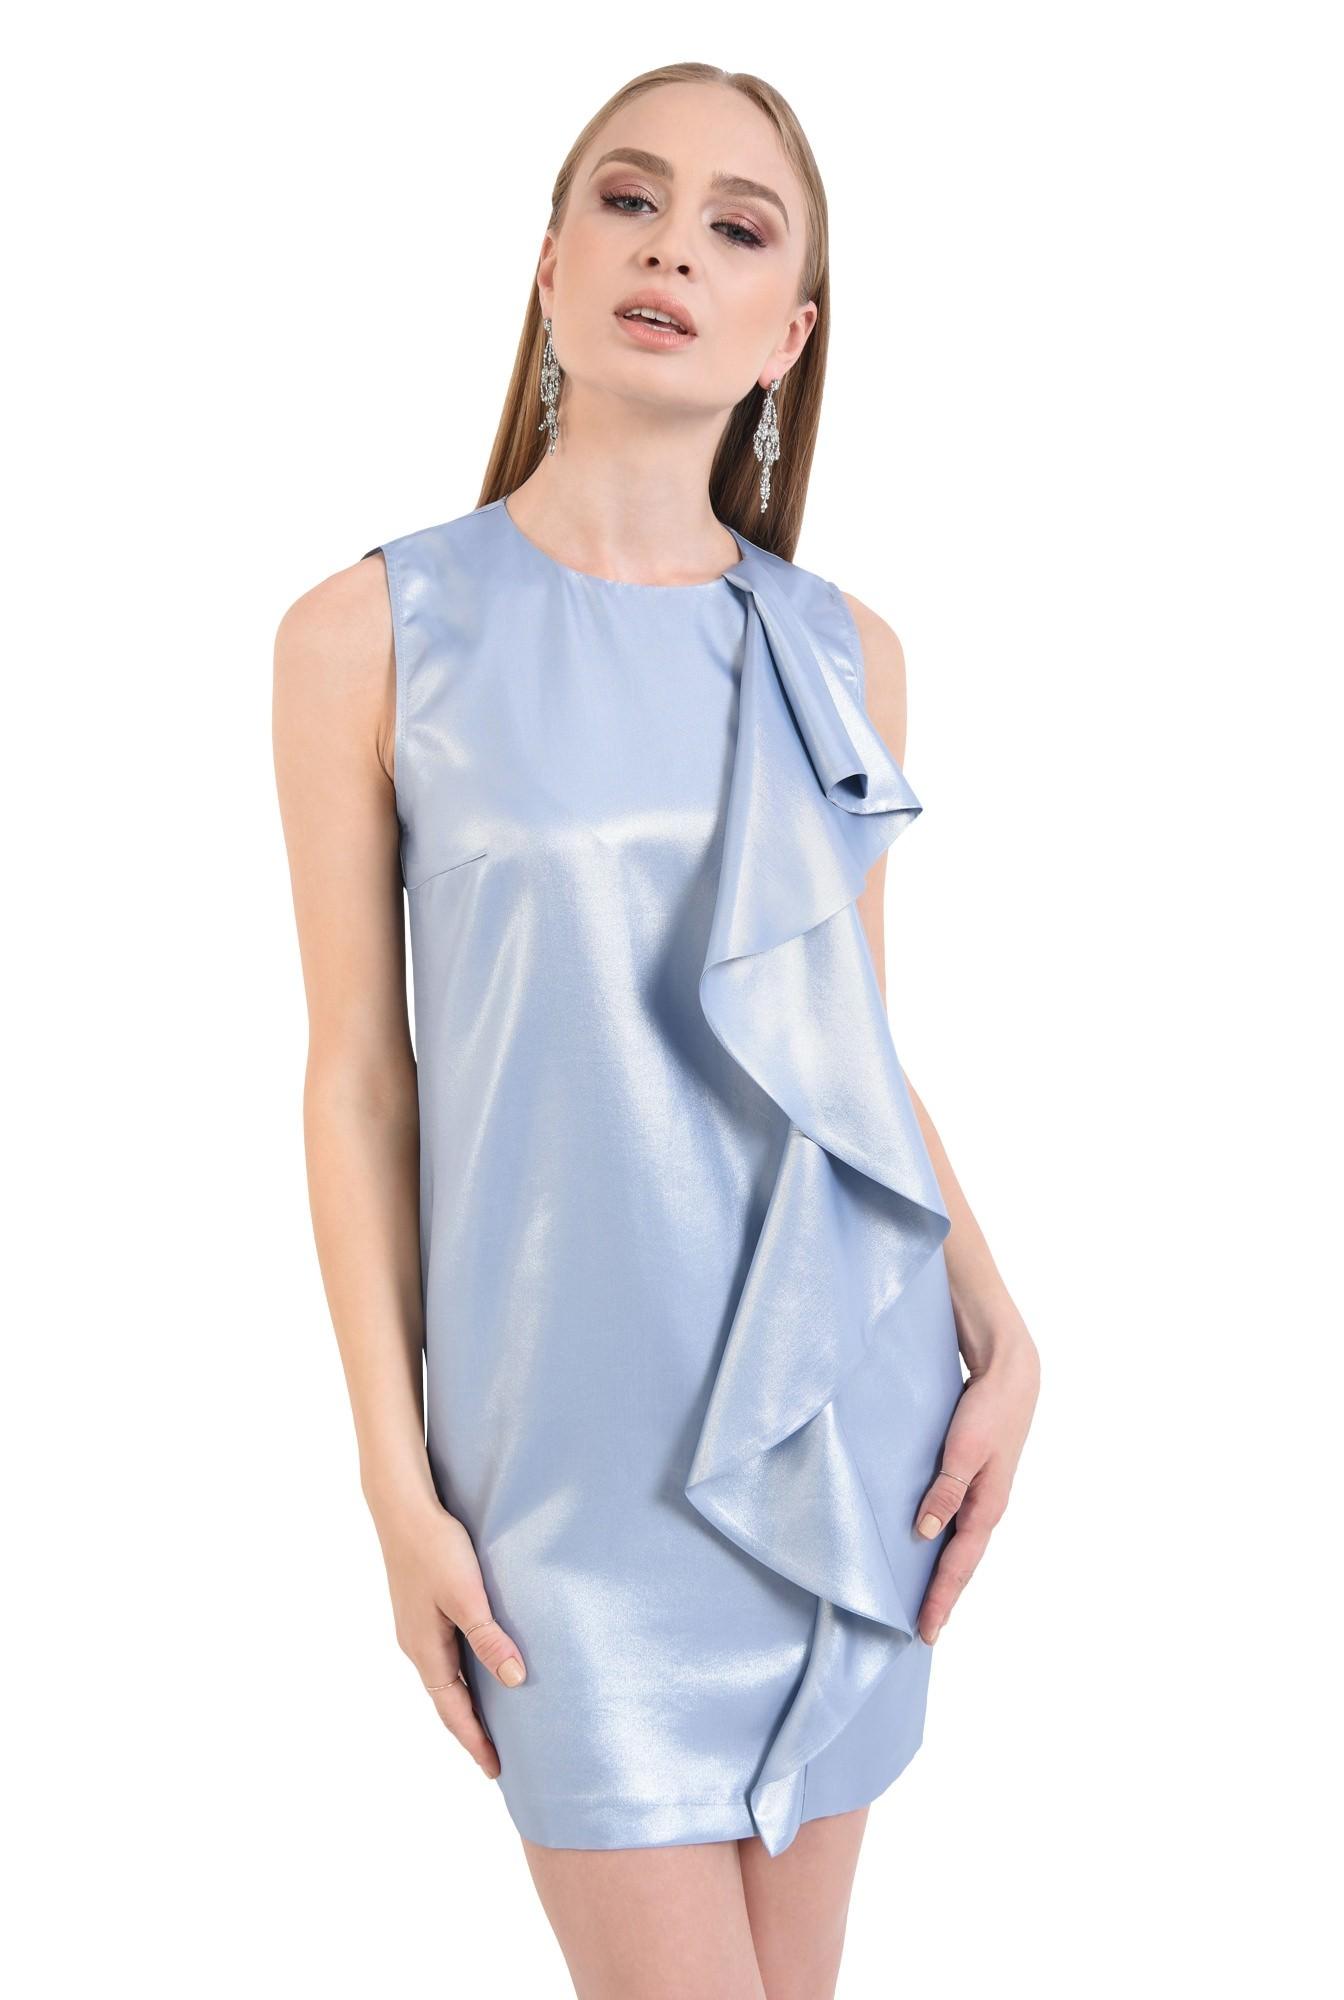 0 - rochie de ocazie, bleu, argintiu, scurta